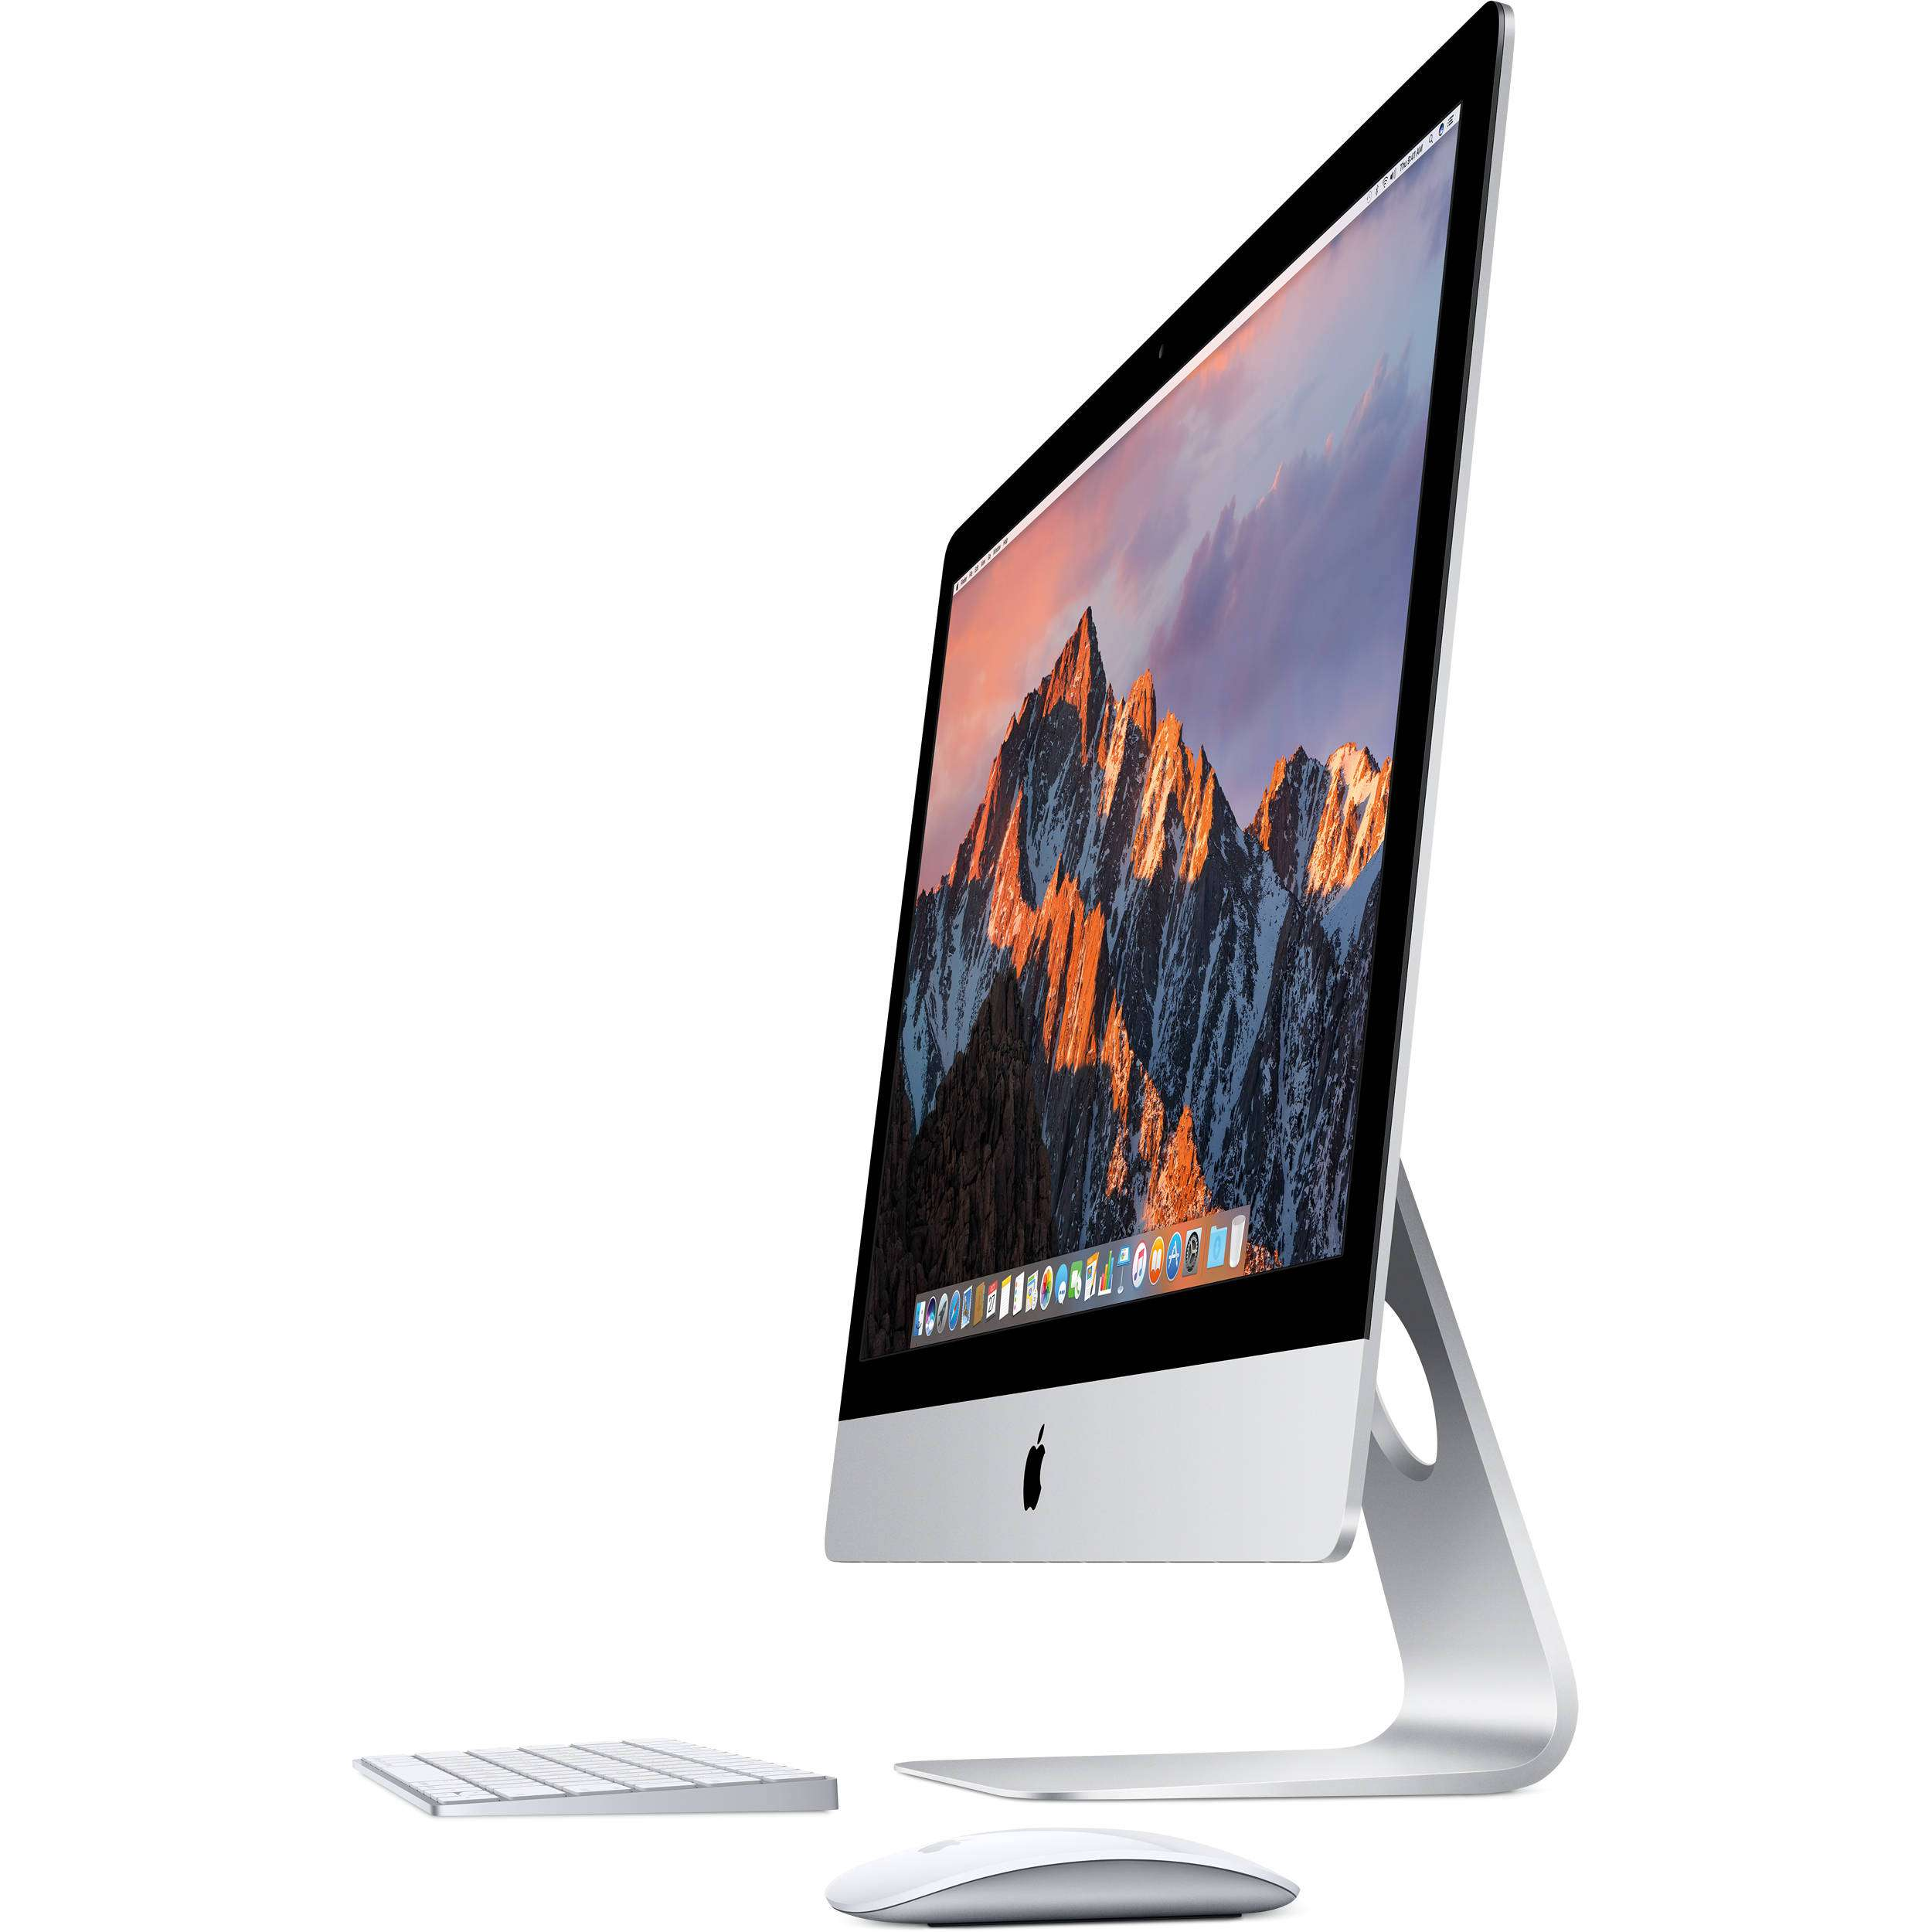 iMac 27 inç 5K 3.4GHz i5 QC 8GB 1TB FD 4GB RP570